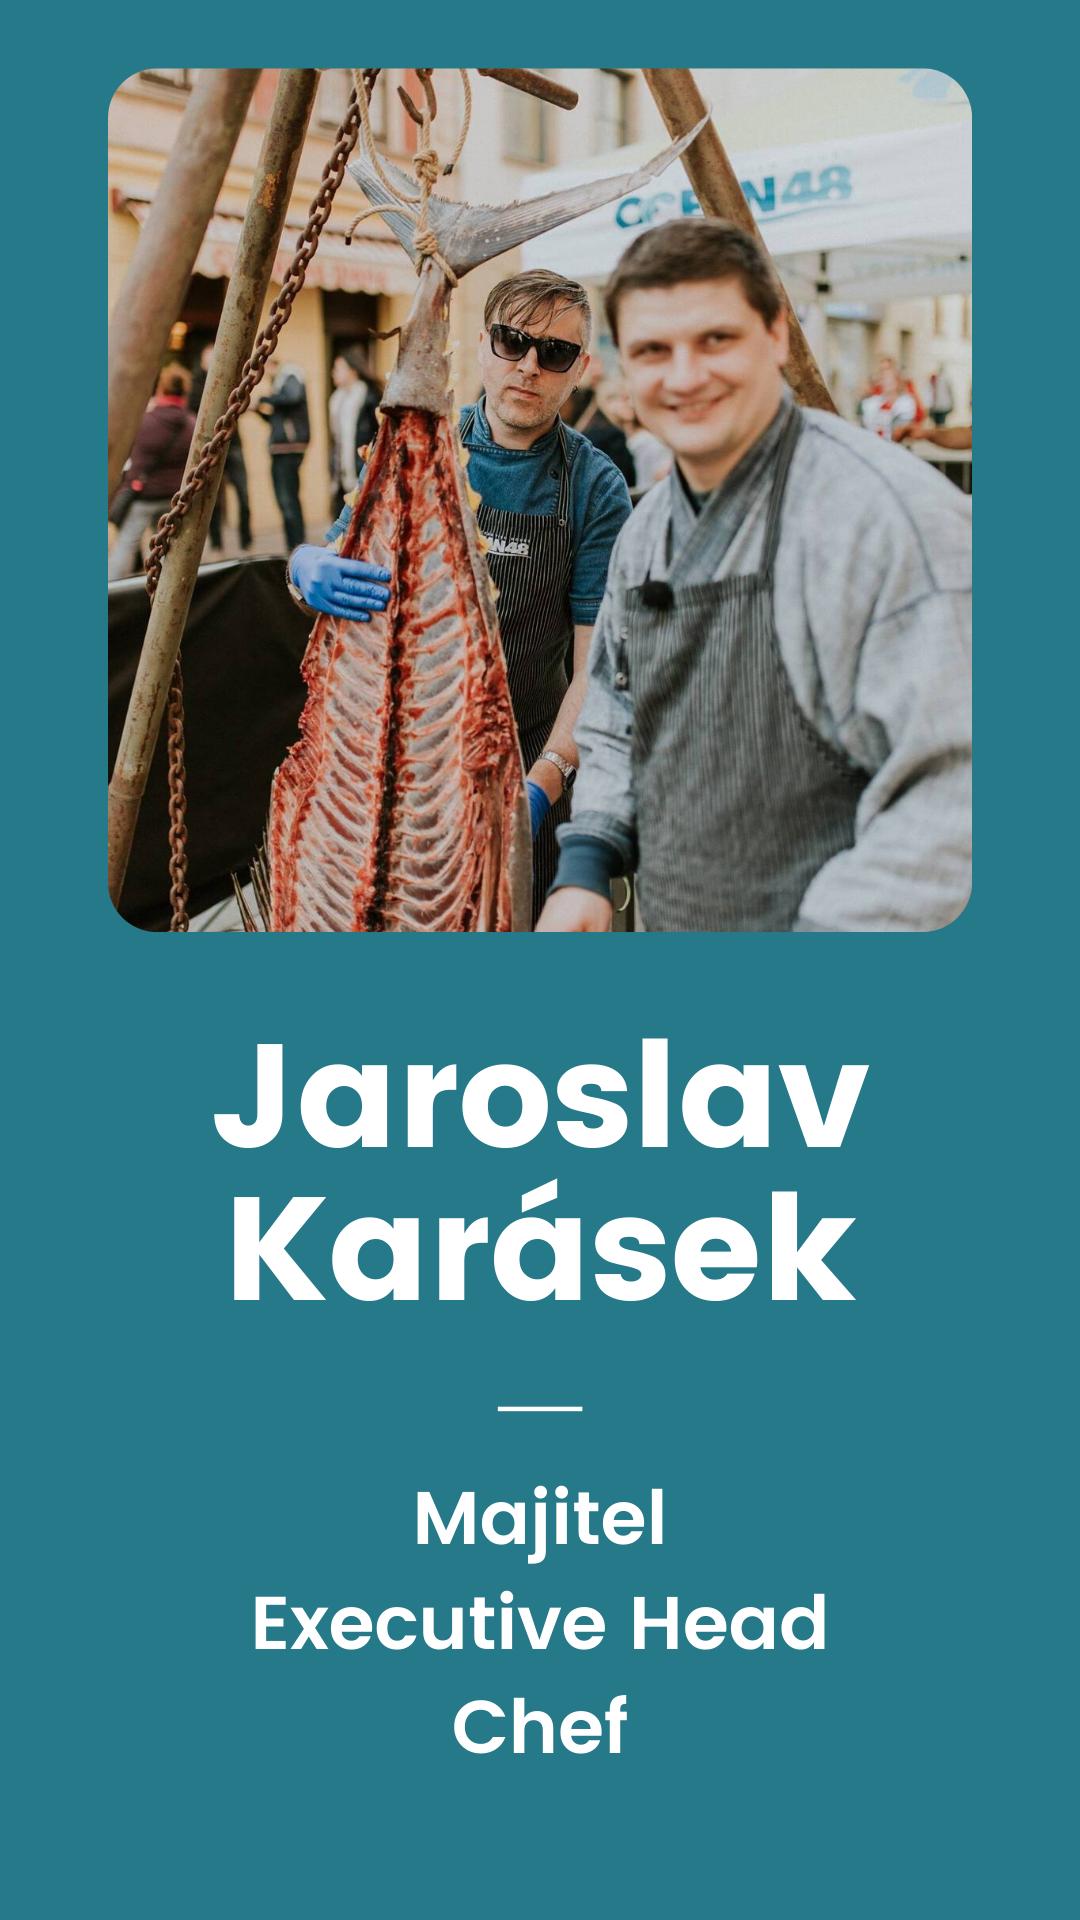 Jaroslav Karásek (1)